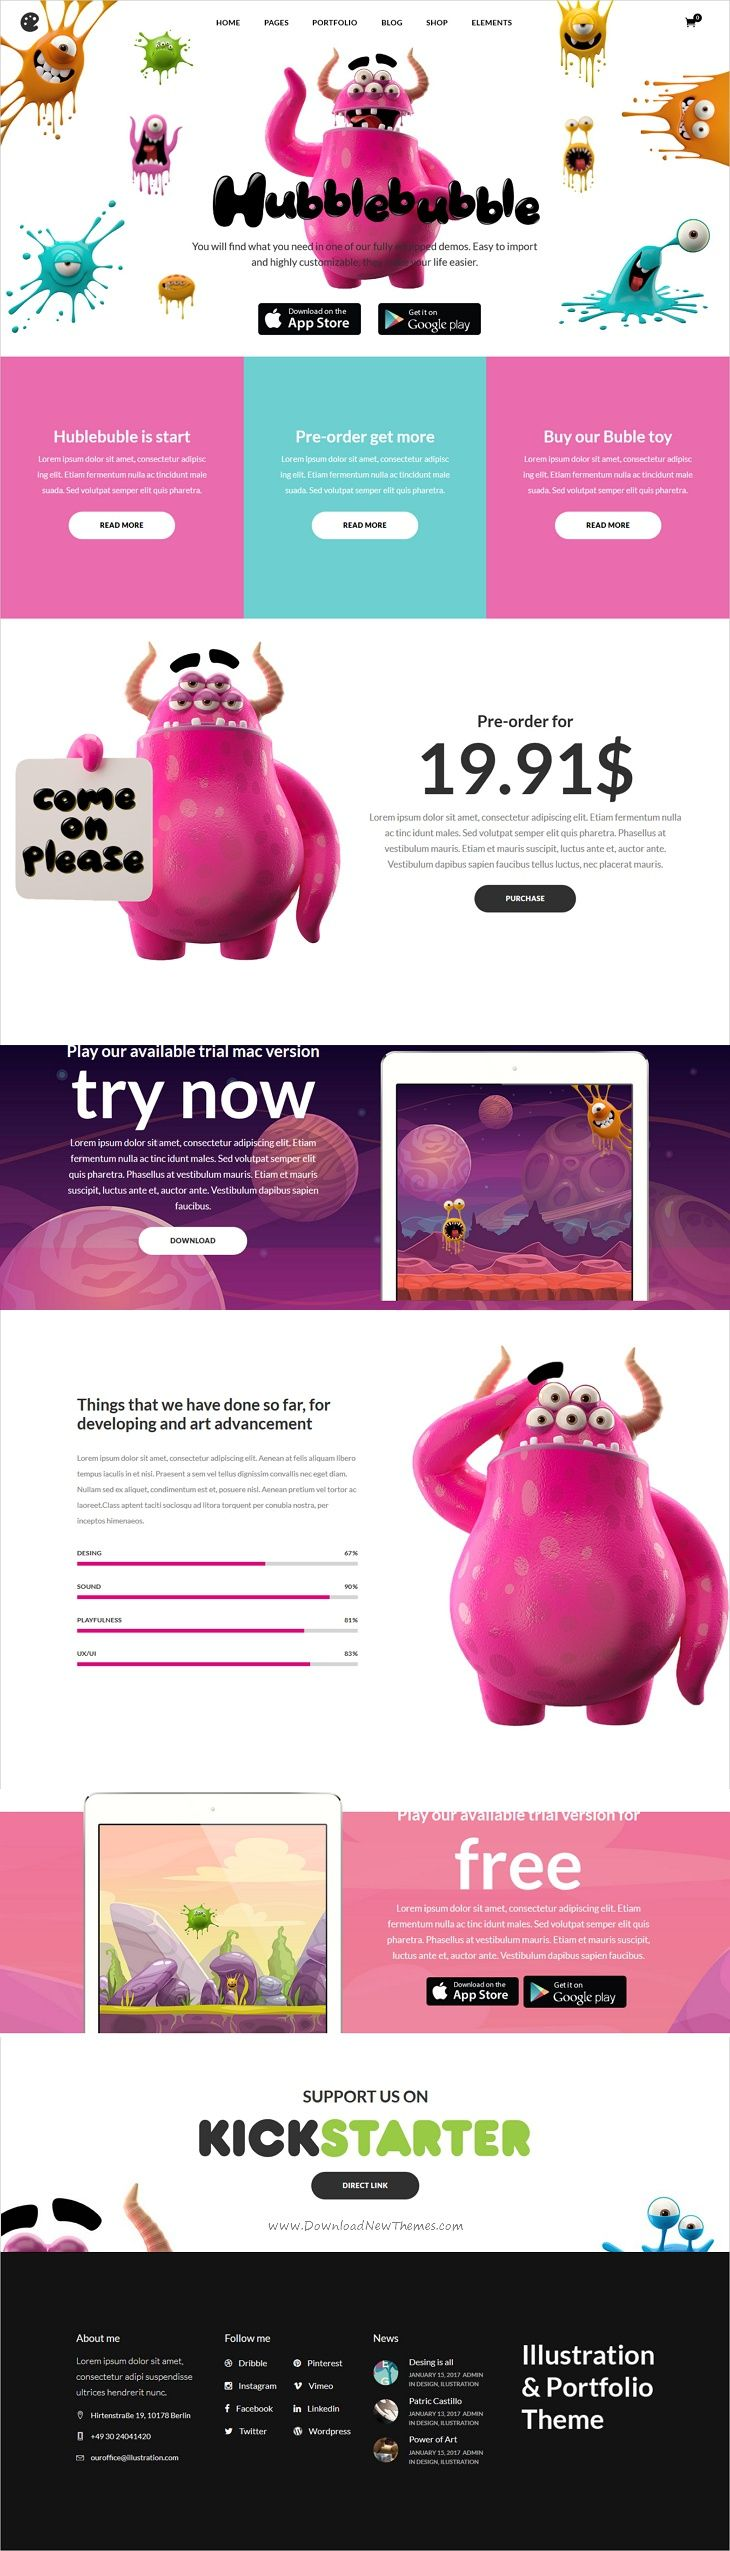 Illustrator is beautifully design 15in1 creative #WordPress theme for #app #game illustrators, animators, concept artists, freelancers or storytellers websites download now➩ https://themeforest.net/item/illustrator-a-portfolio-theme-for-illustrators-designers-and-artists/19374923?ref=Datasata